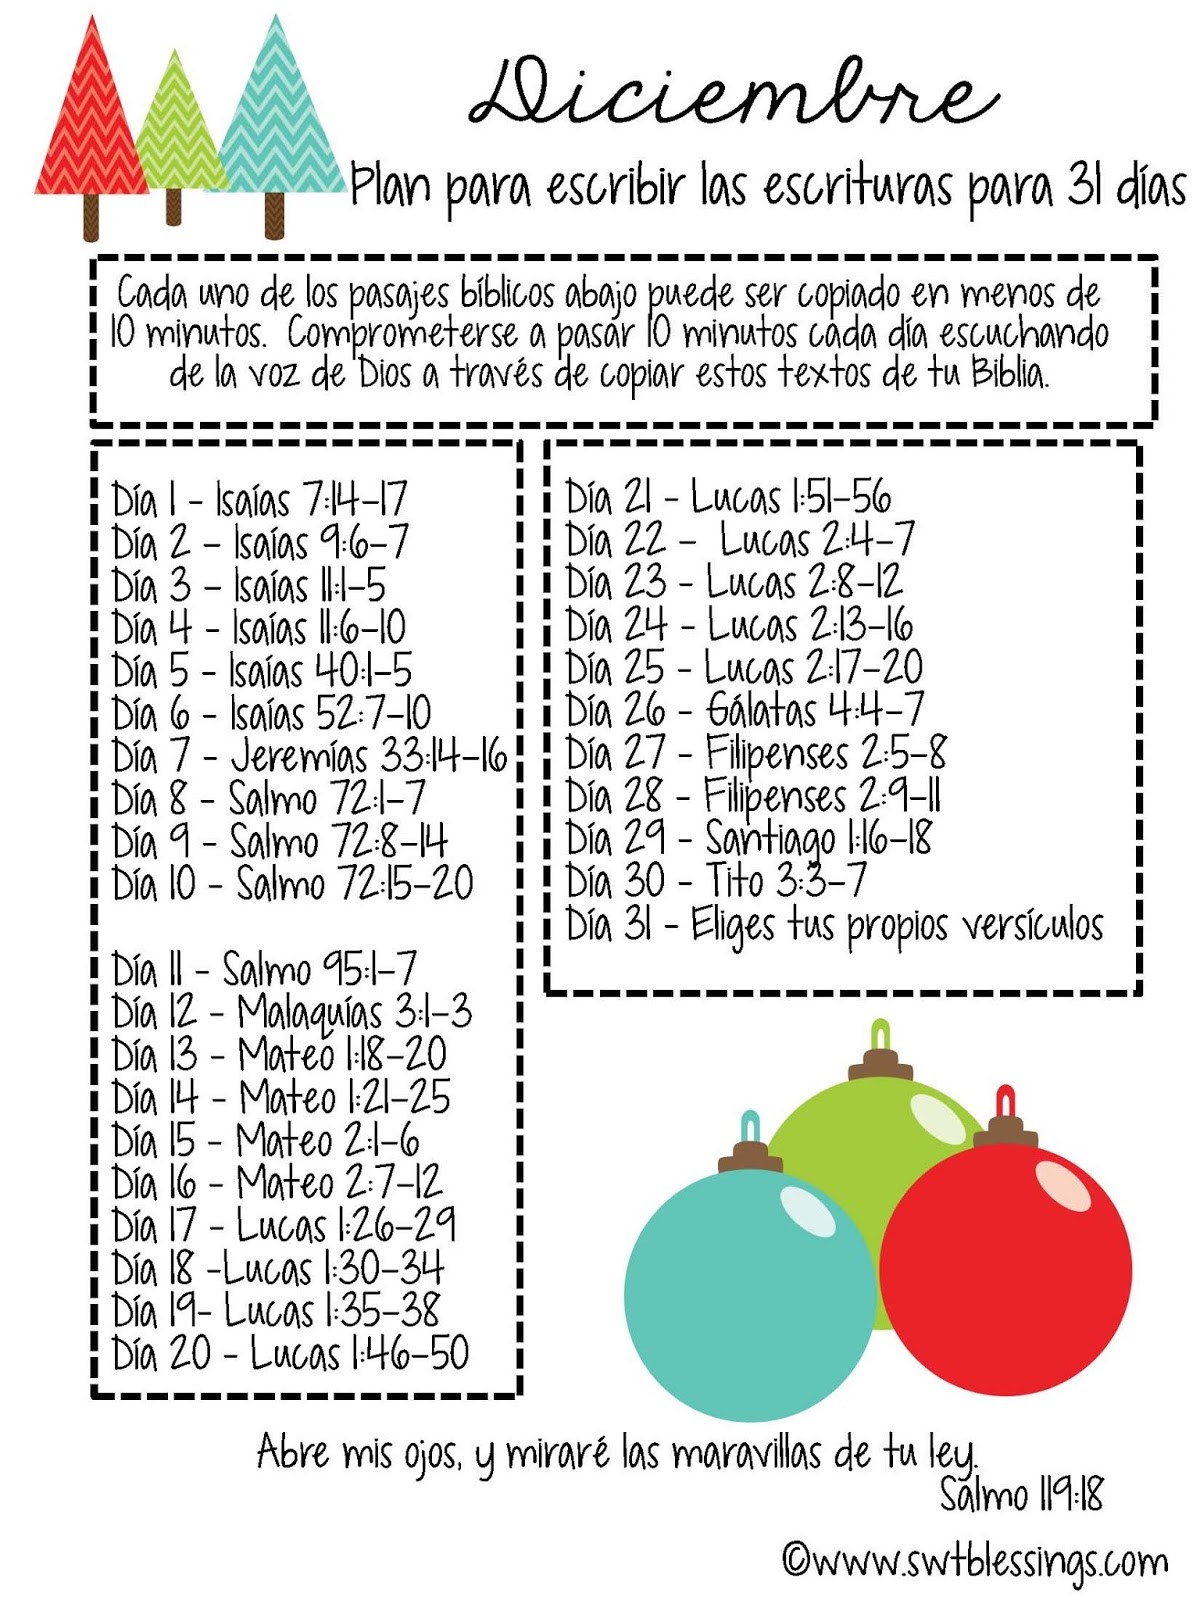 Sweet Blessings: December Scripture Writing Plan